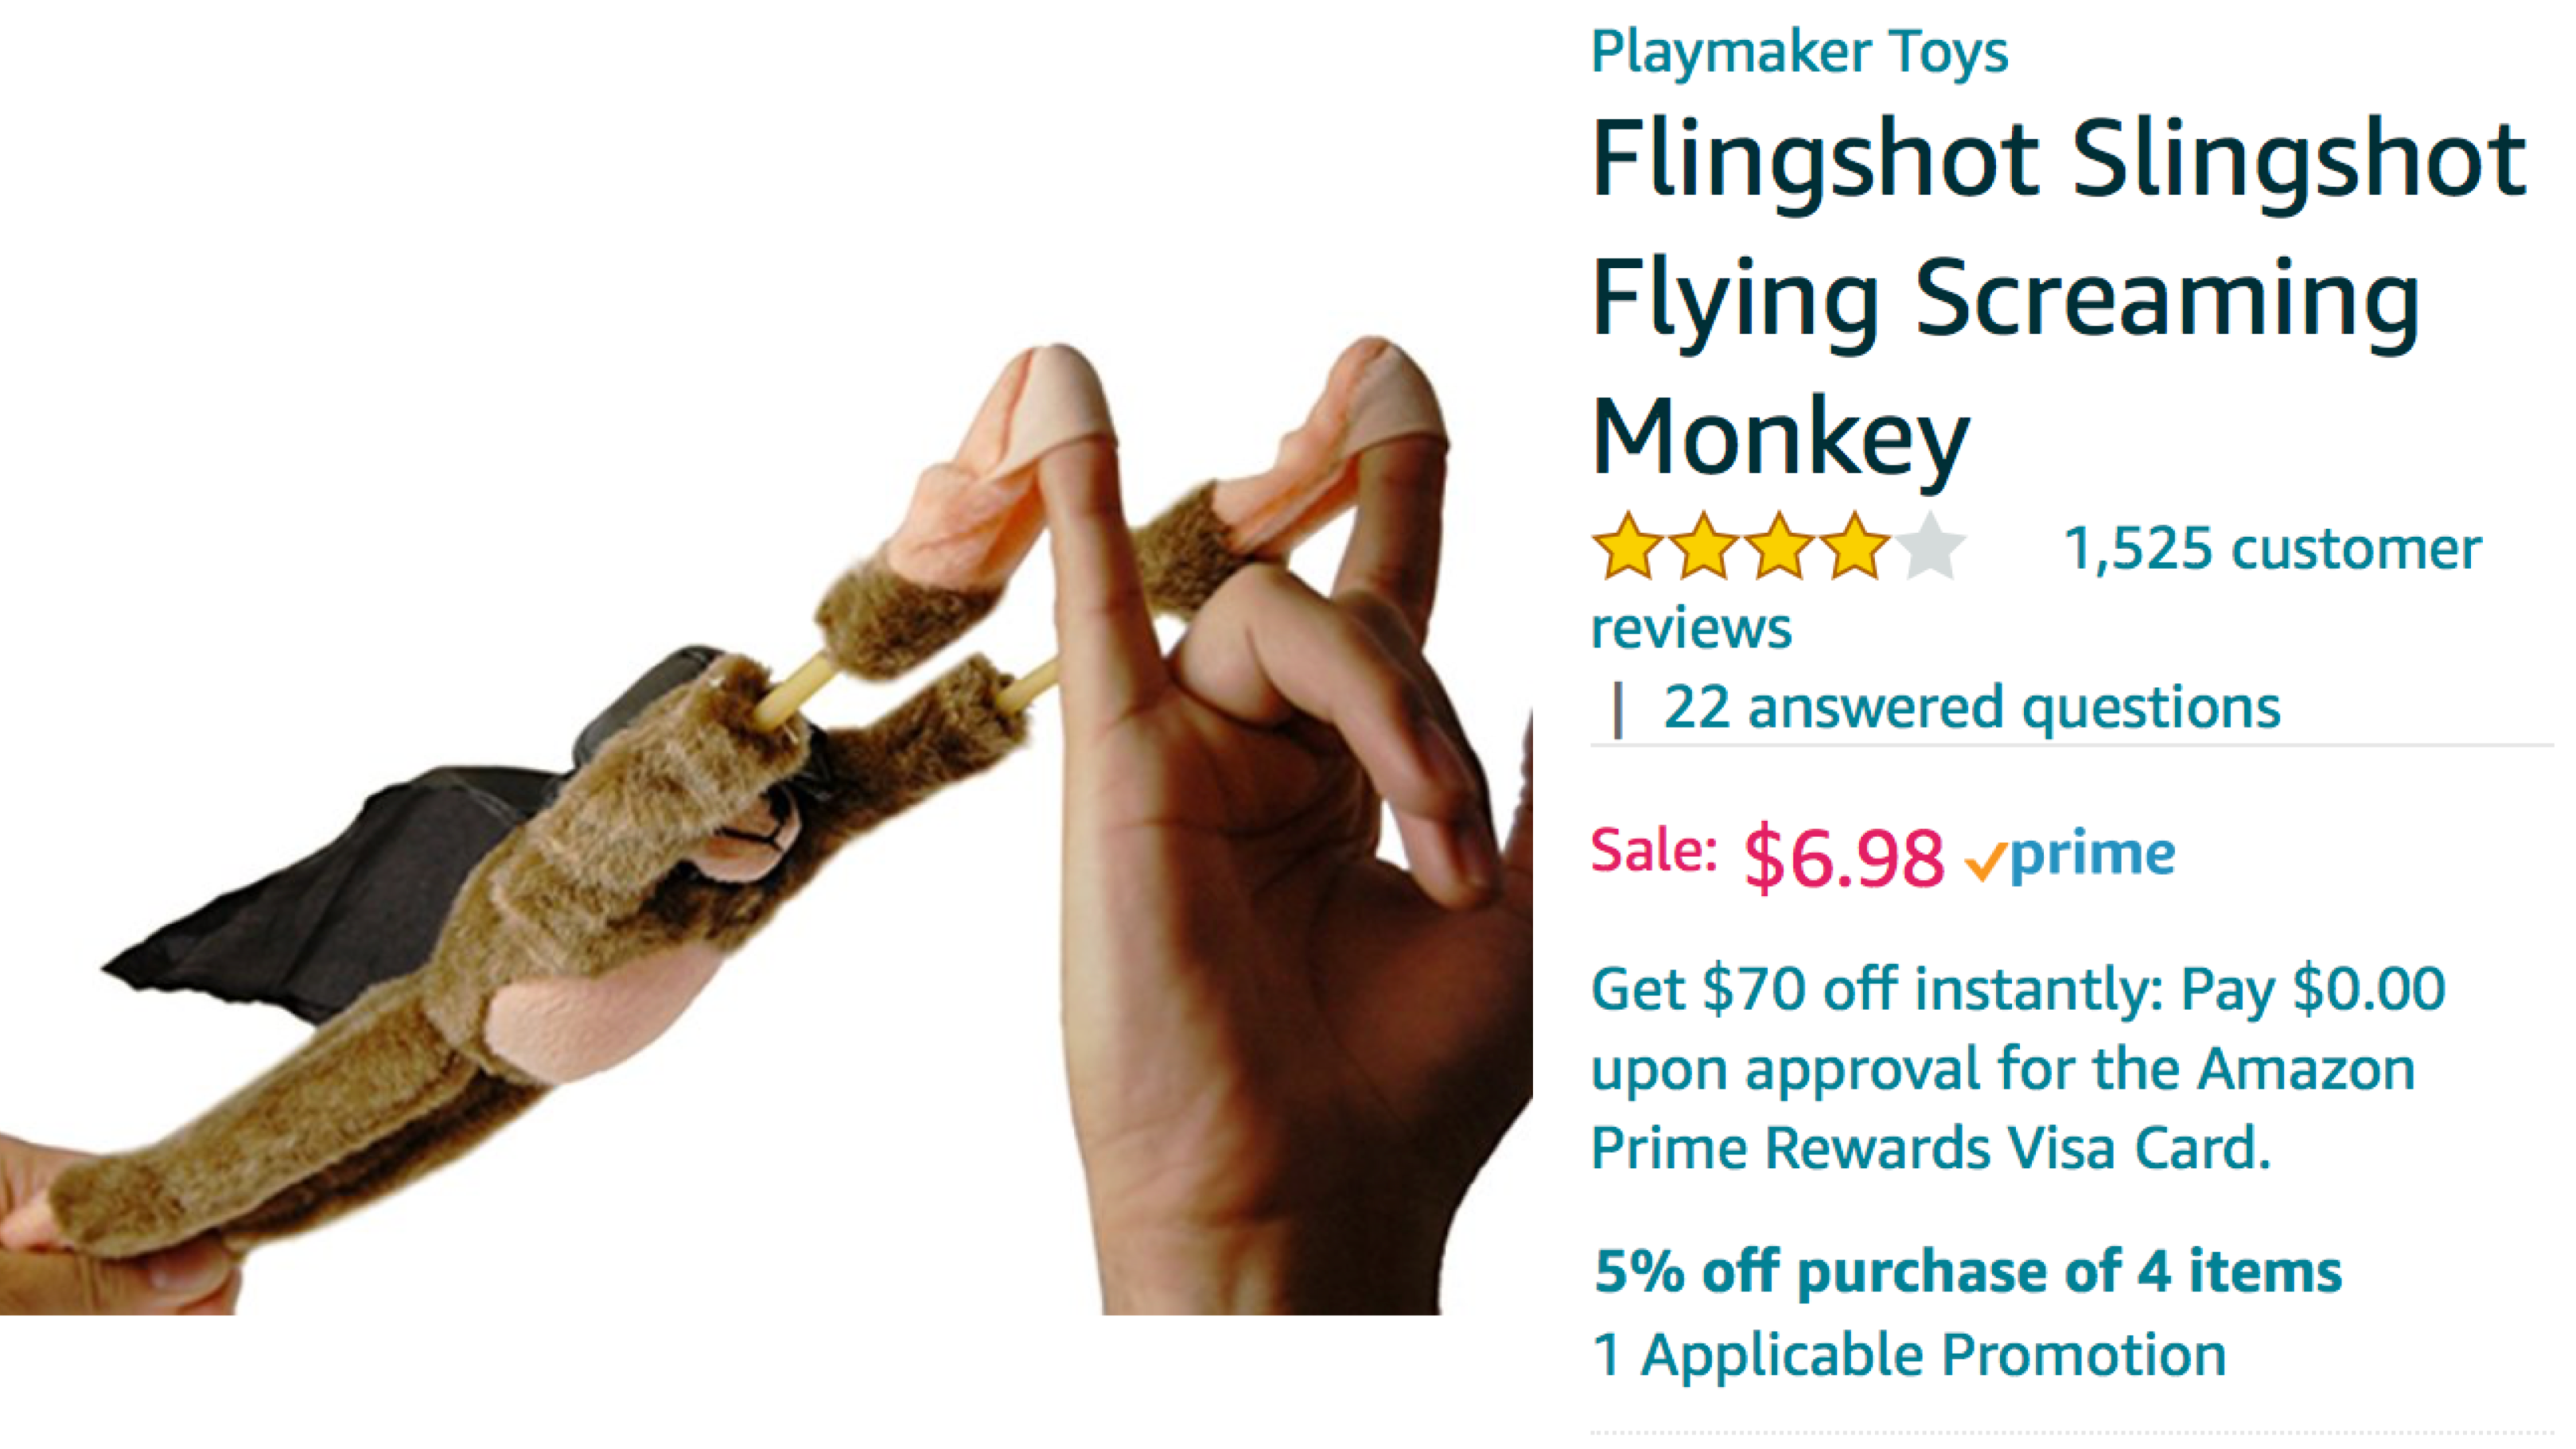 Slingshot Flingshot Flying Screaming Monkey